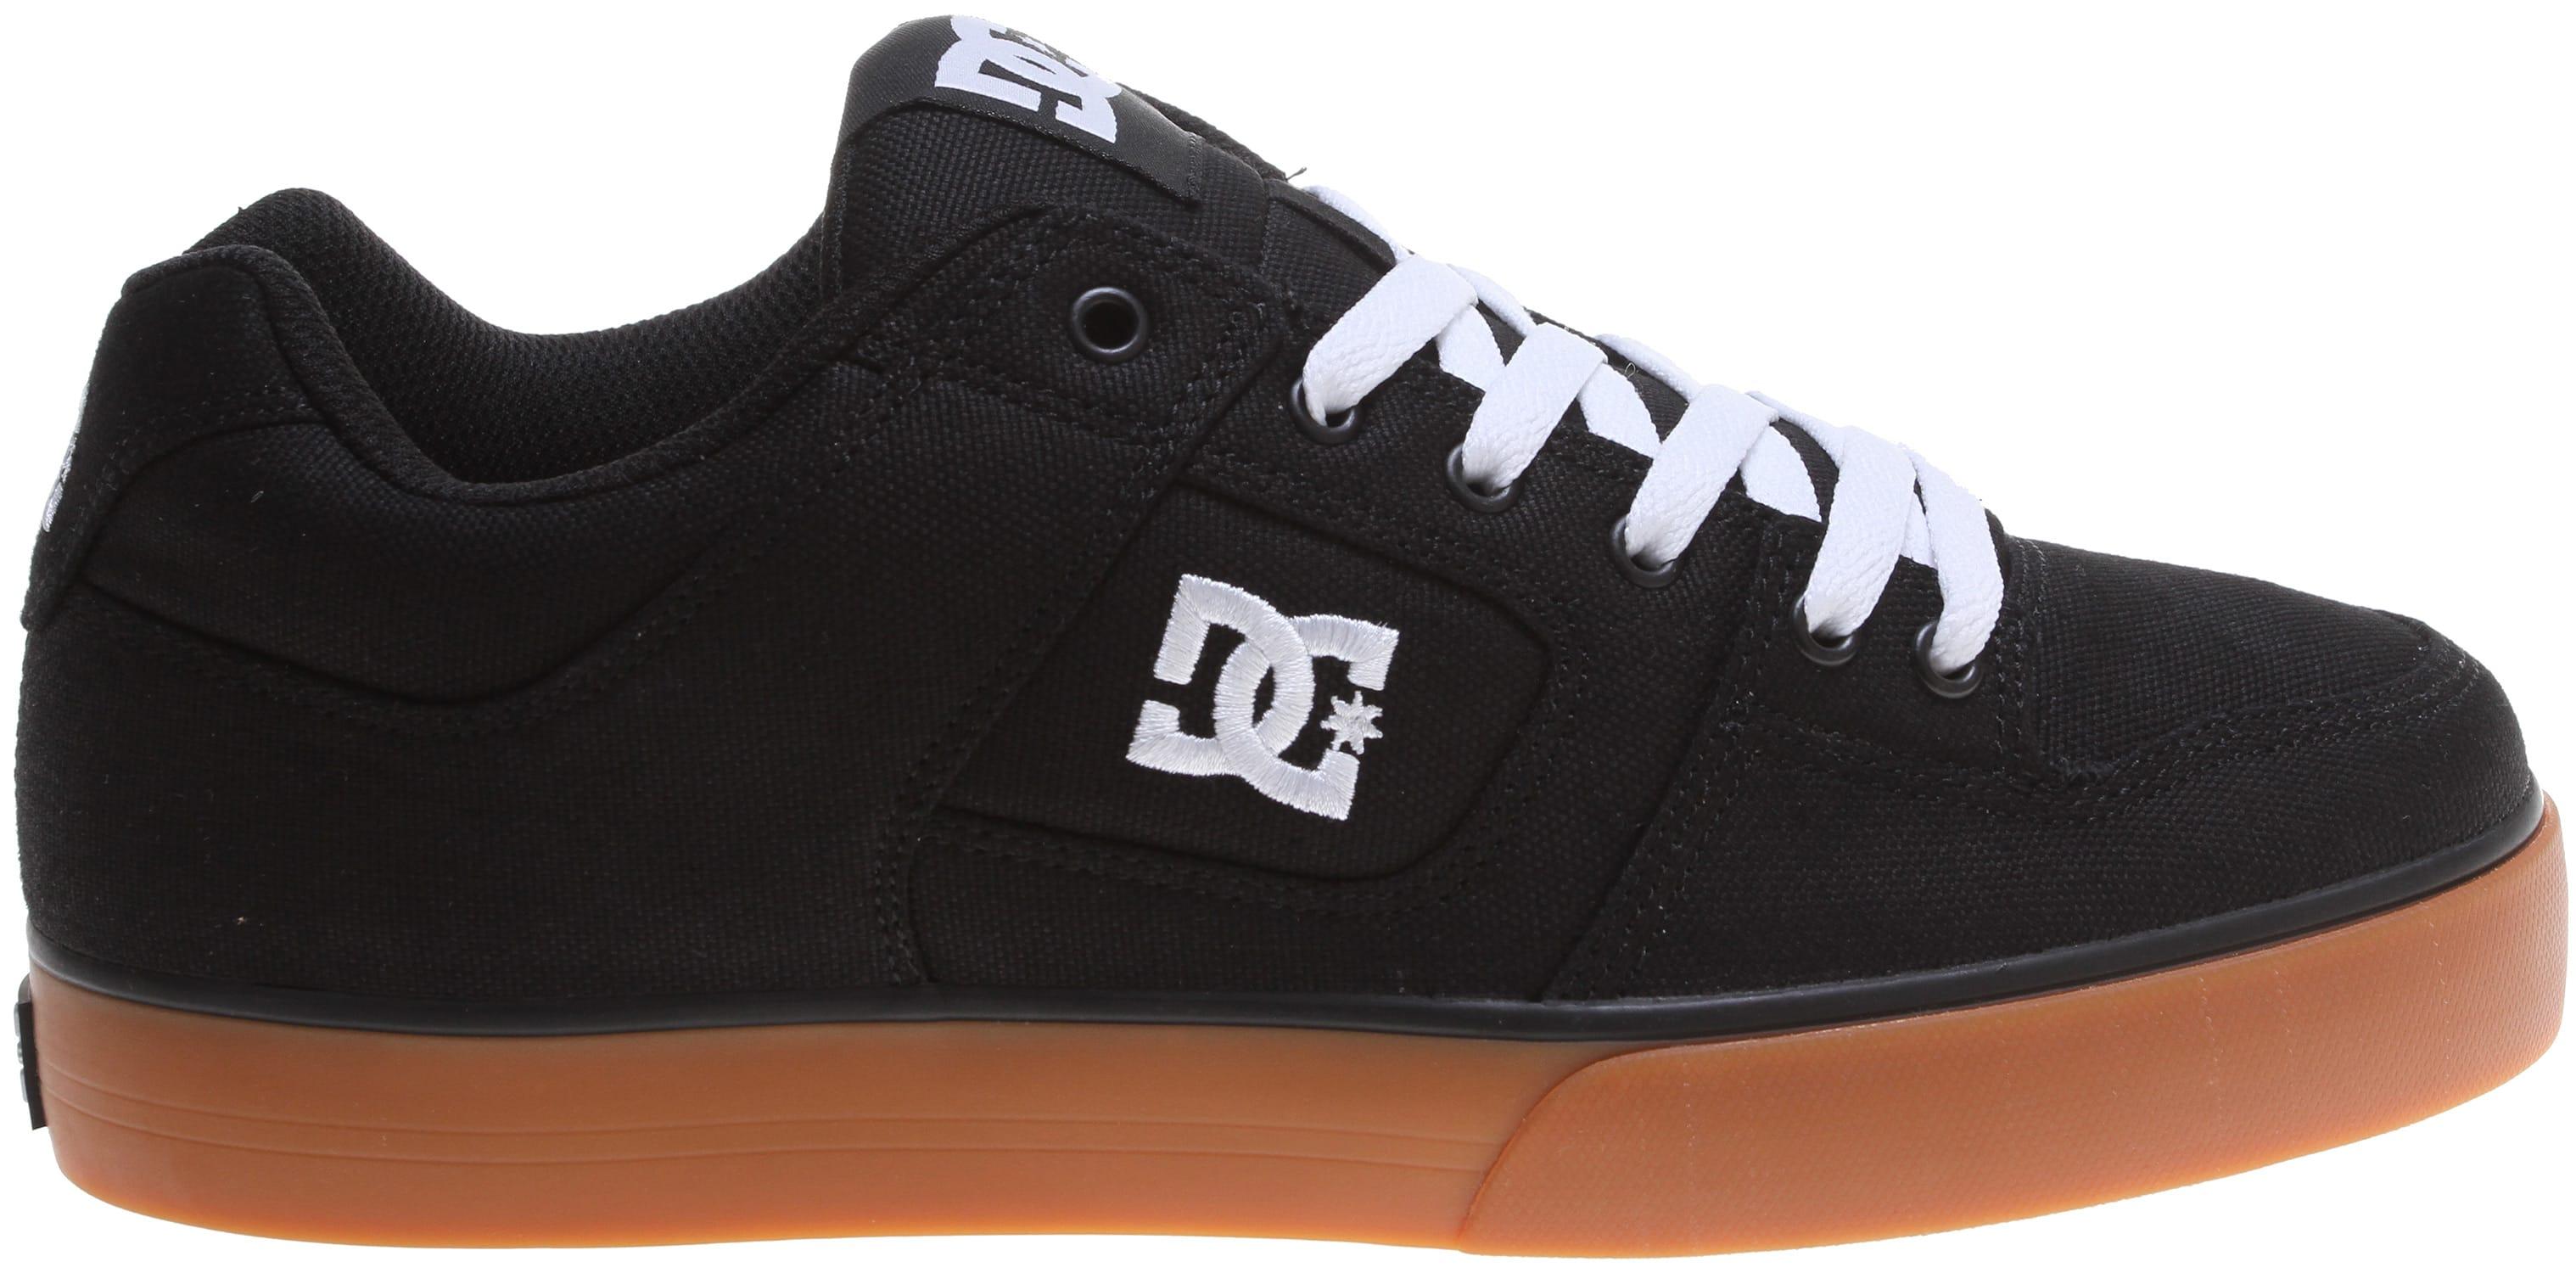 DC Pure TX Skate Shoes - thumbnail 1